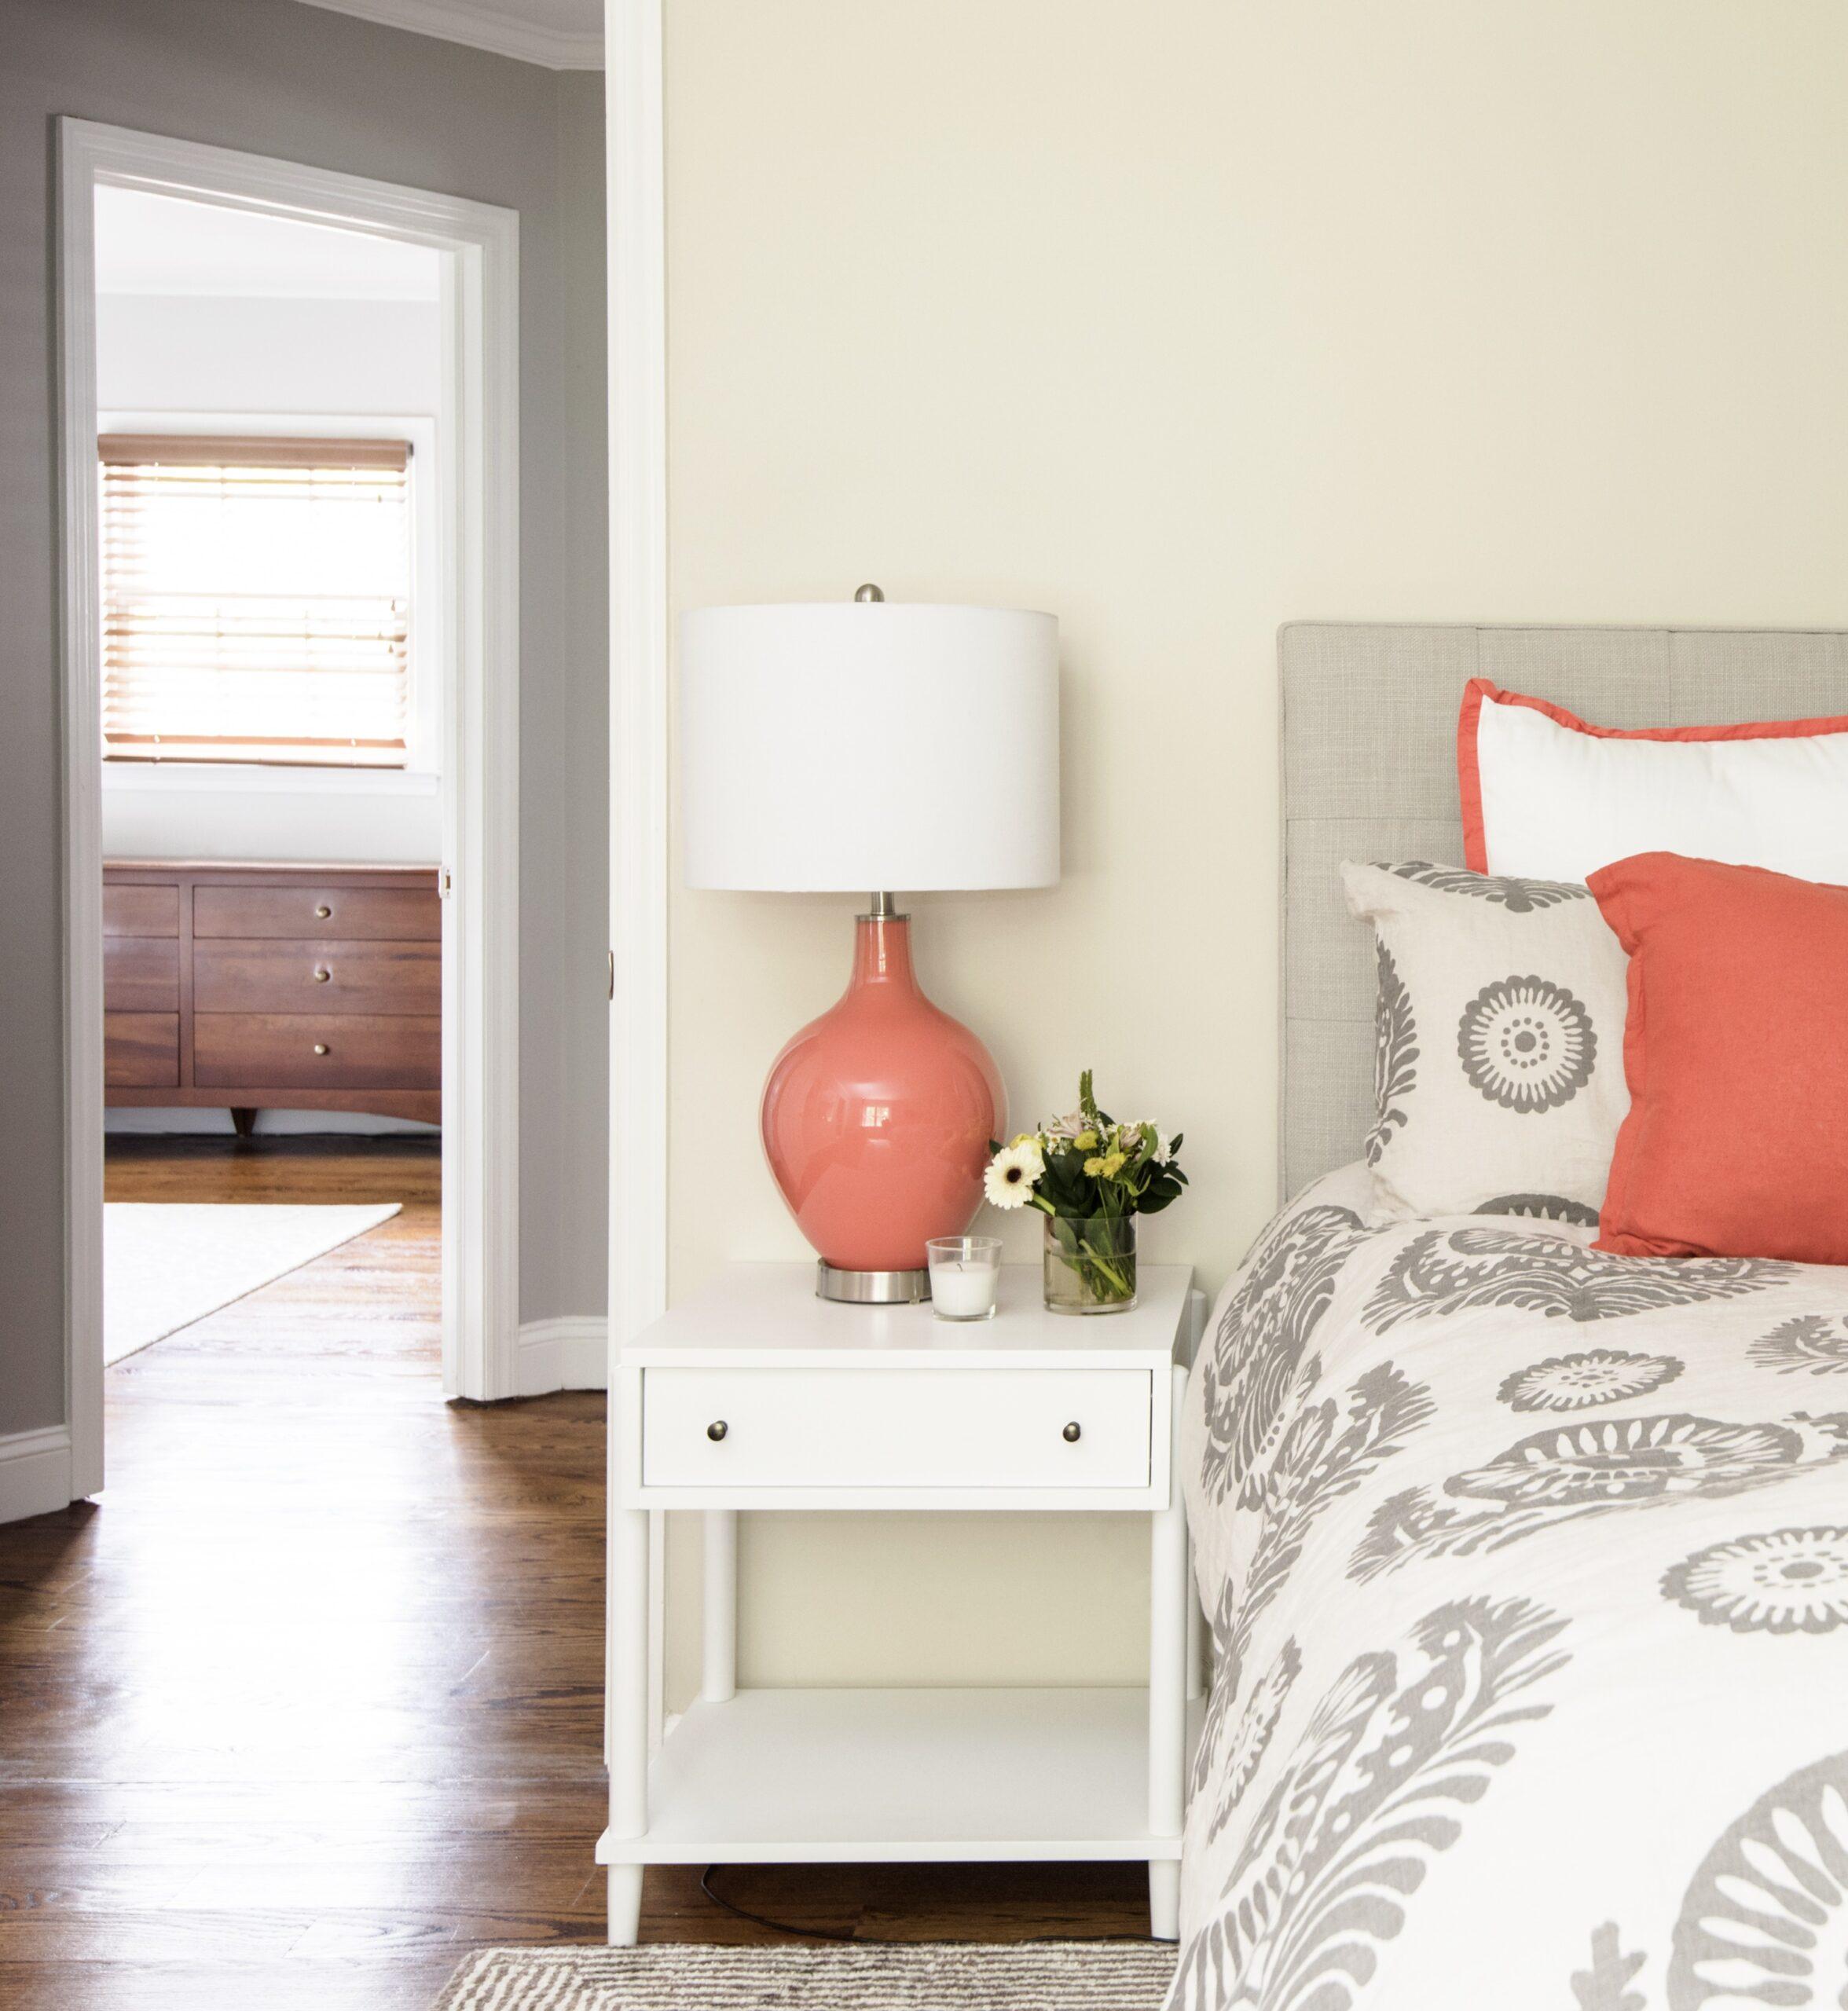 2021 Most Popular Interior Design Styles Trends